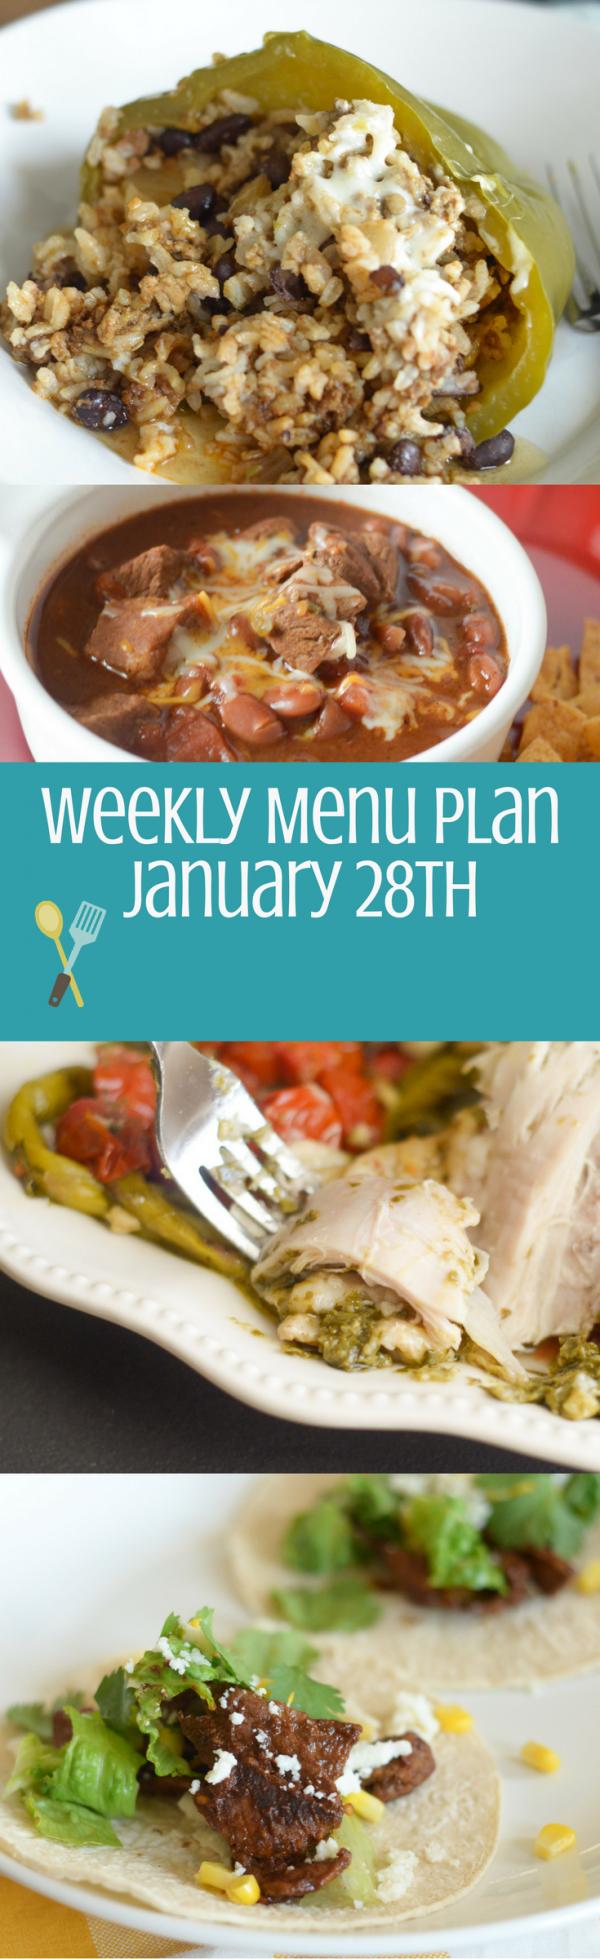 Weekly Menu Plan - January 28th